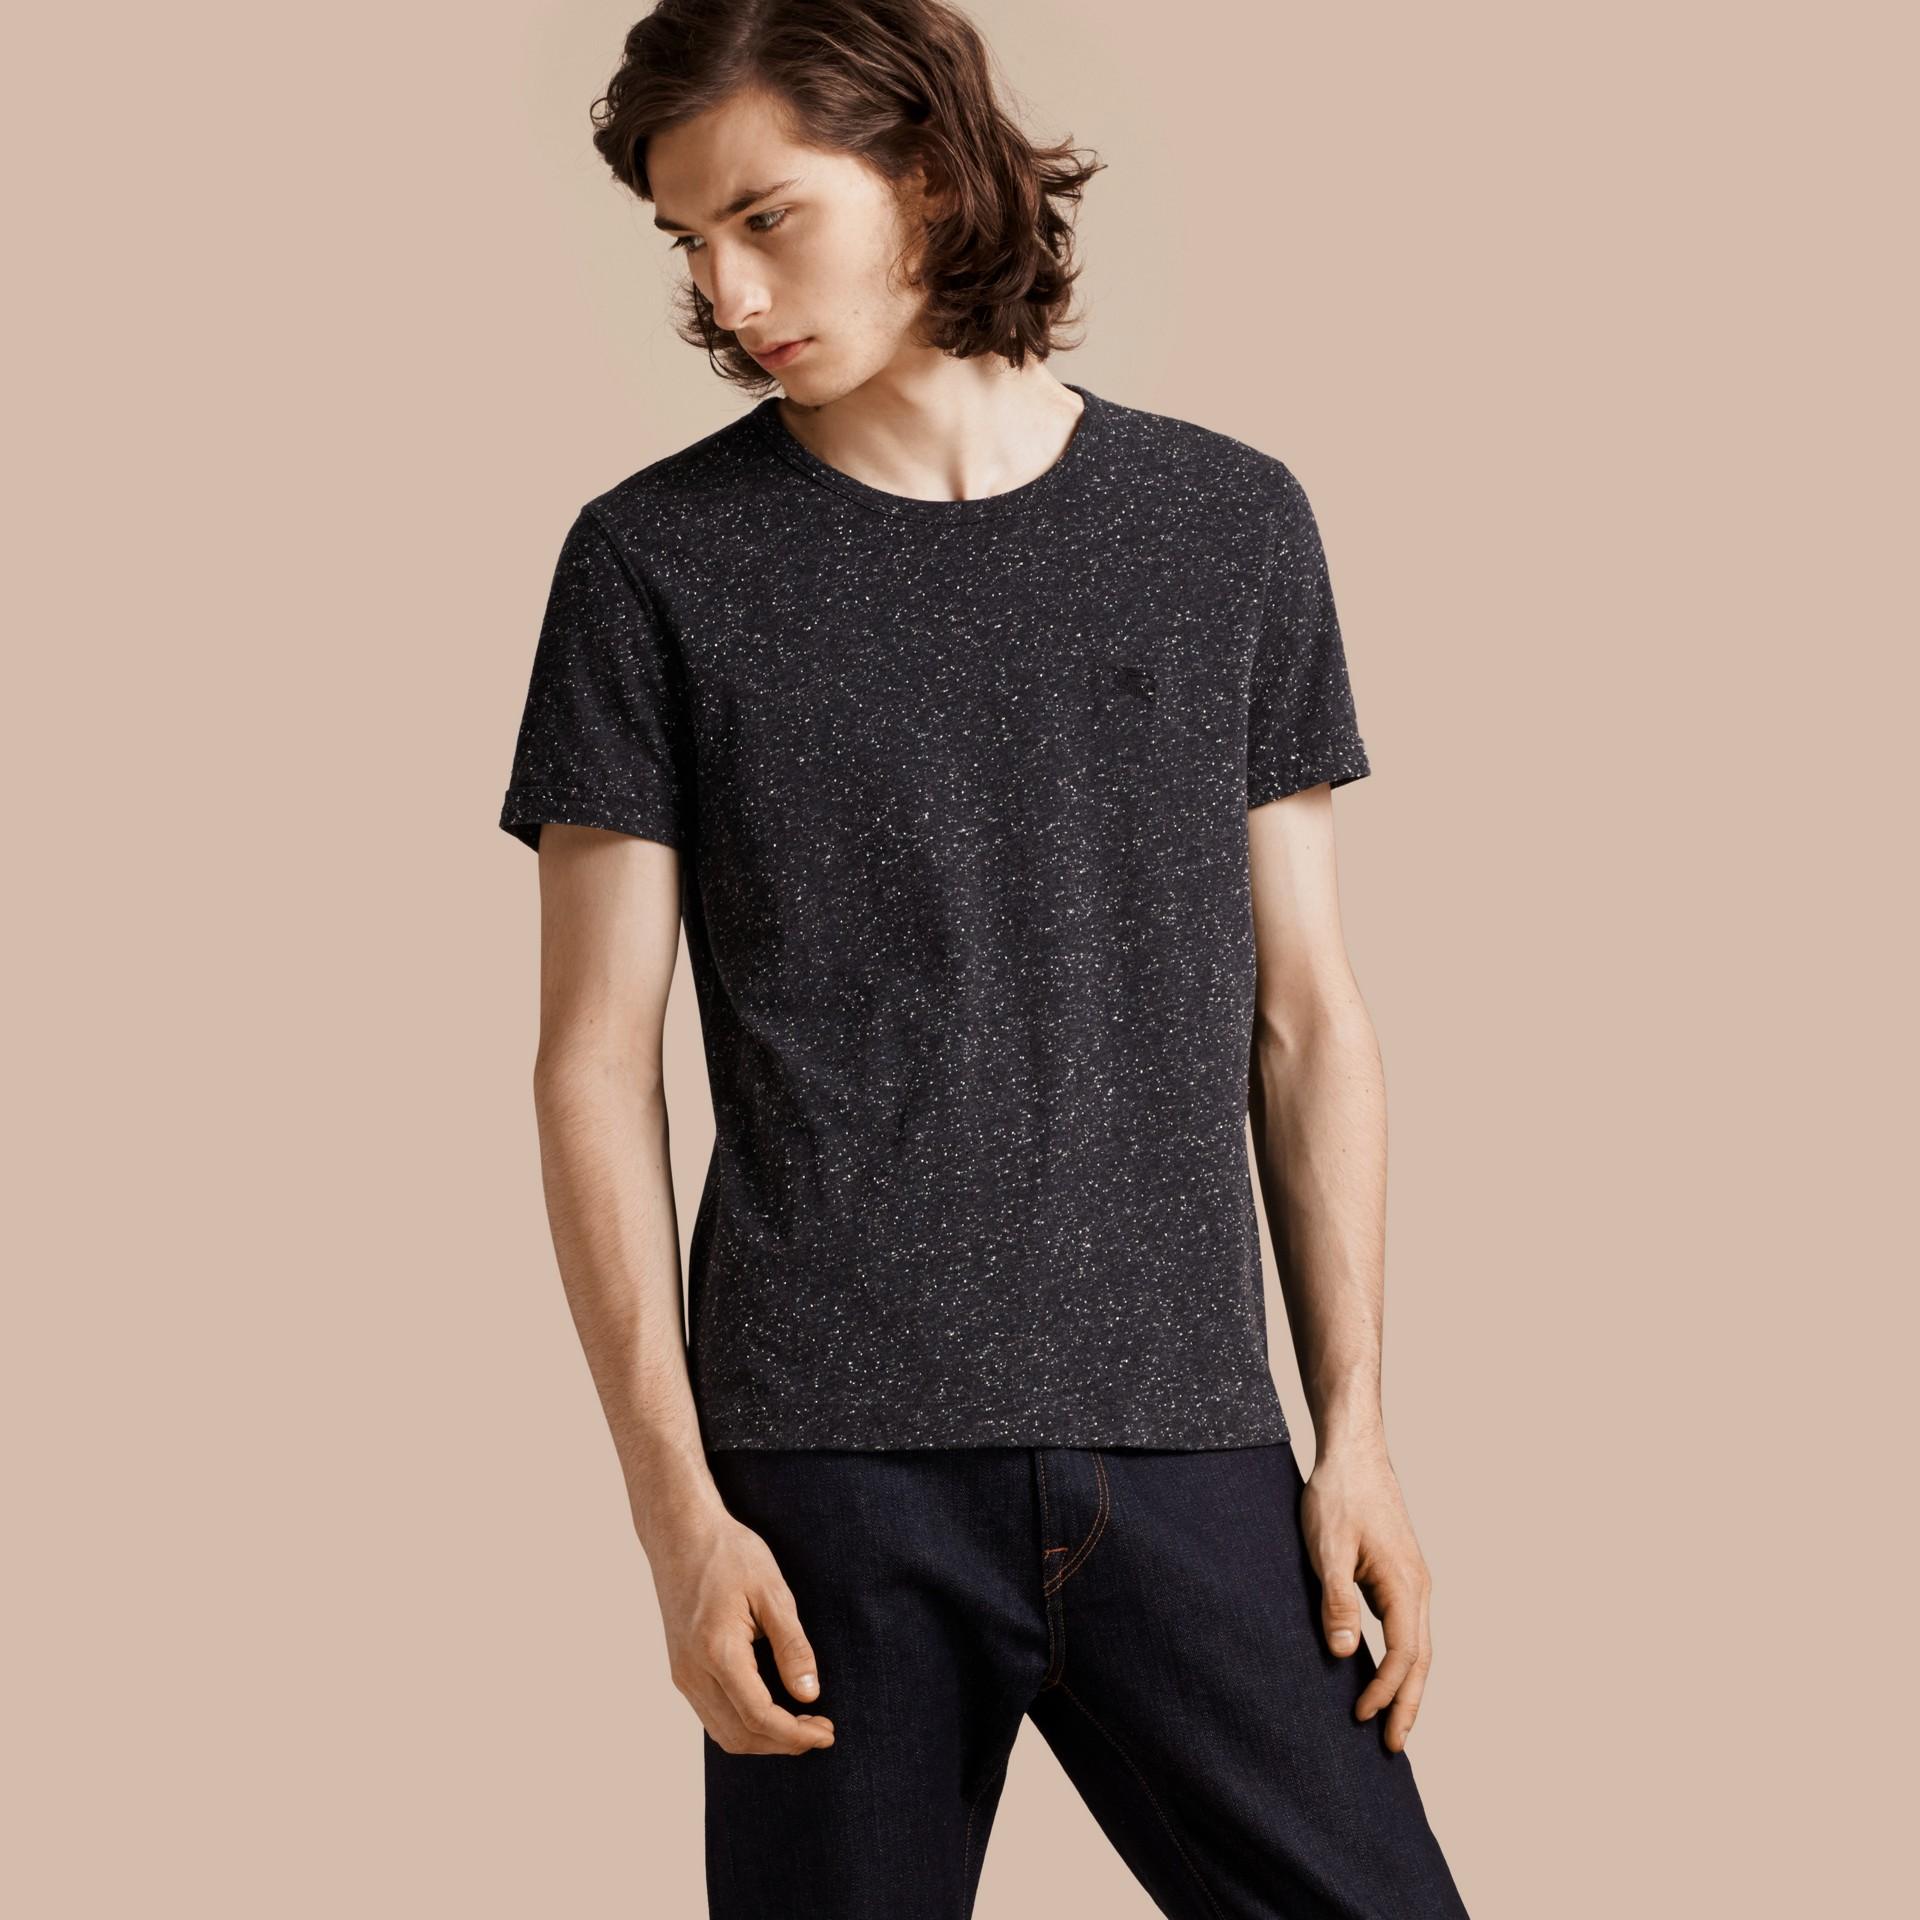 Black Crew Neck Flecked Cotton Jersey T-Shirt Black - gallery image 1